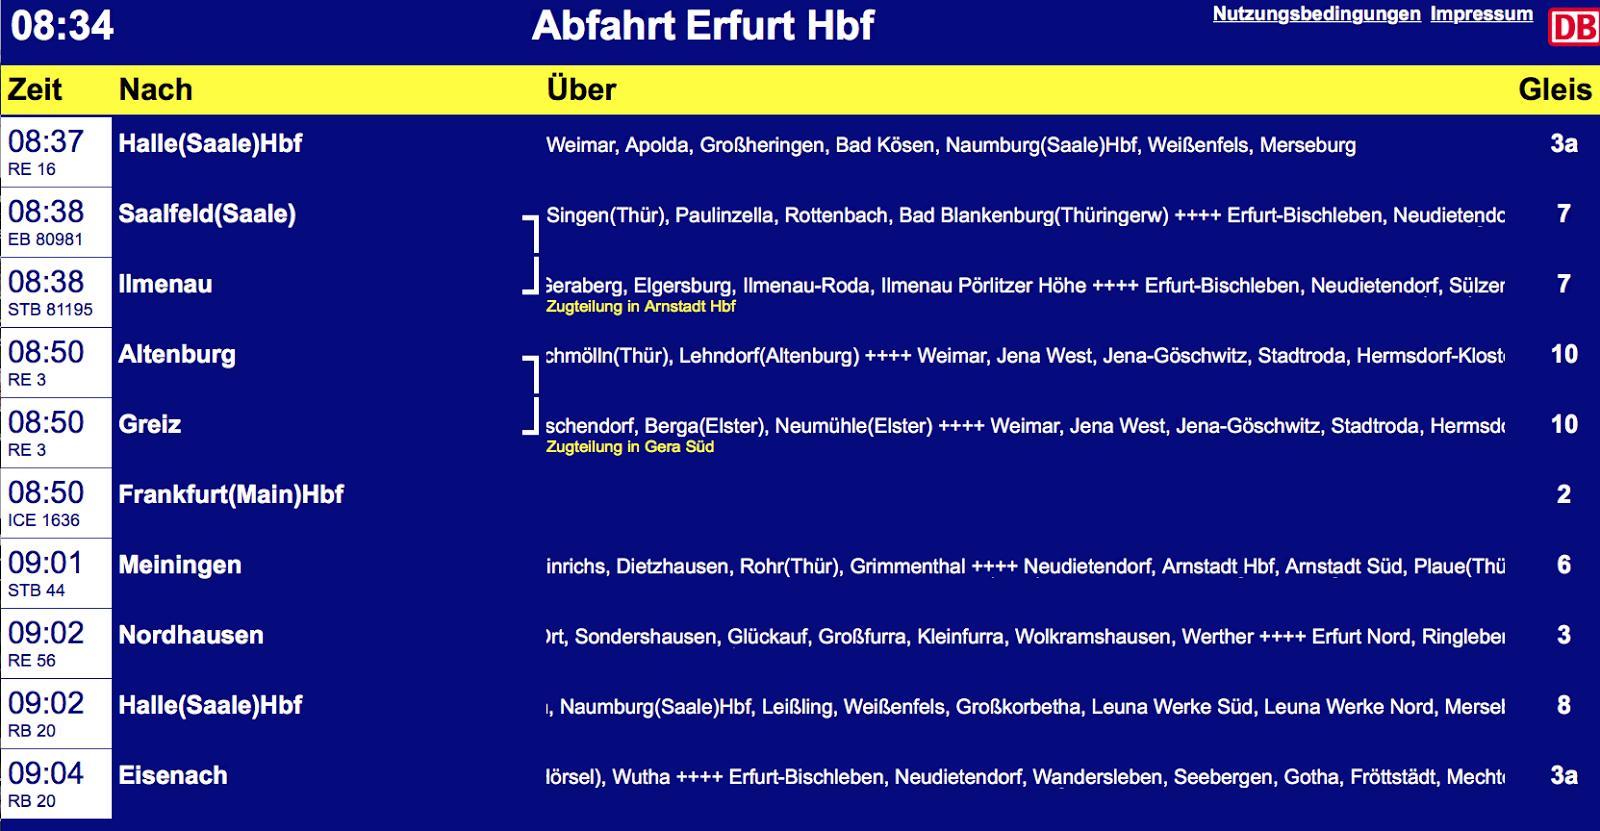 Abfahrt Hbf. Erfurt